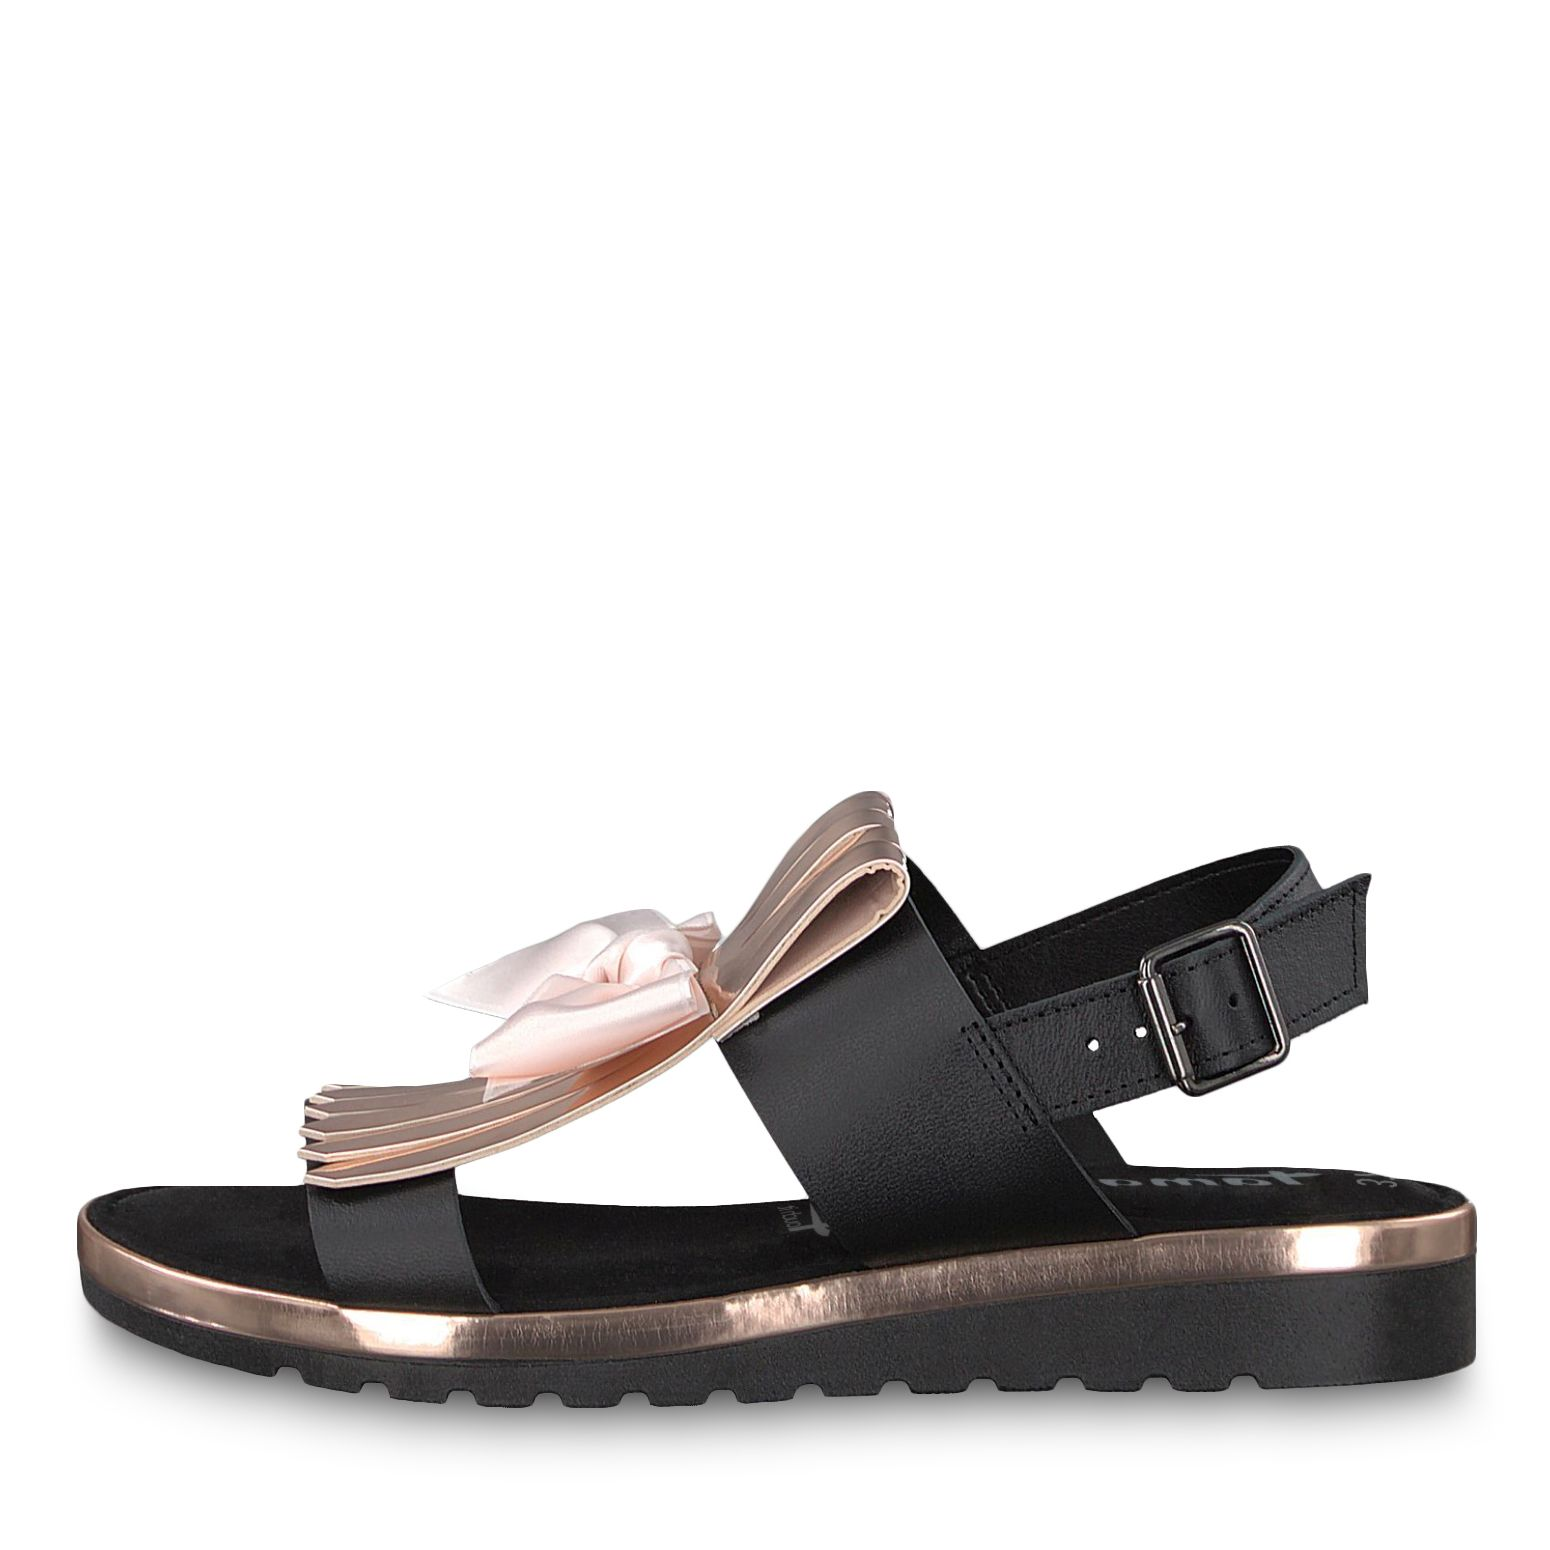 ostra 1 1 28707 38 tamaris sandalen online kaufen. Black Bedroom Furniture Sets. Home Design Ideas